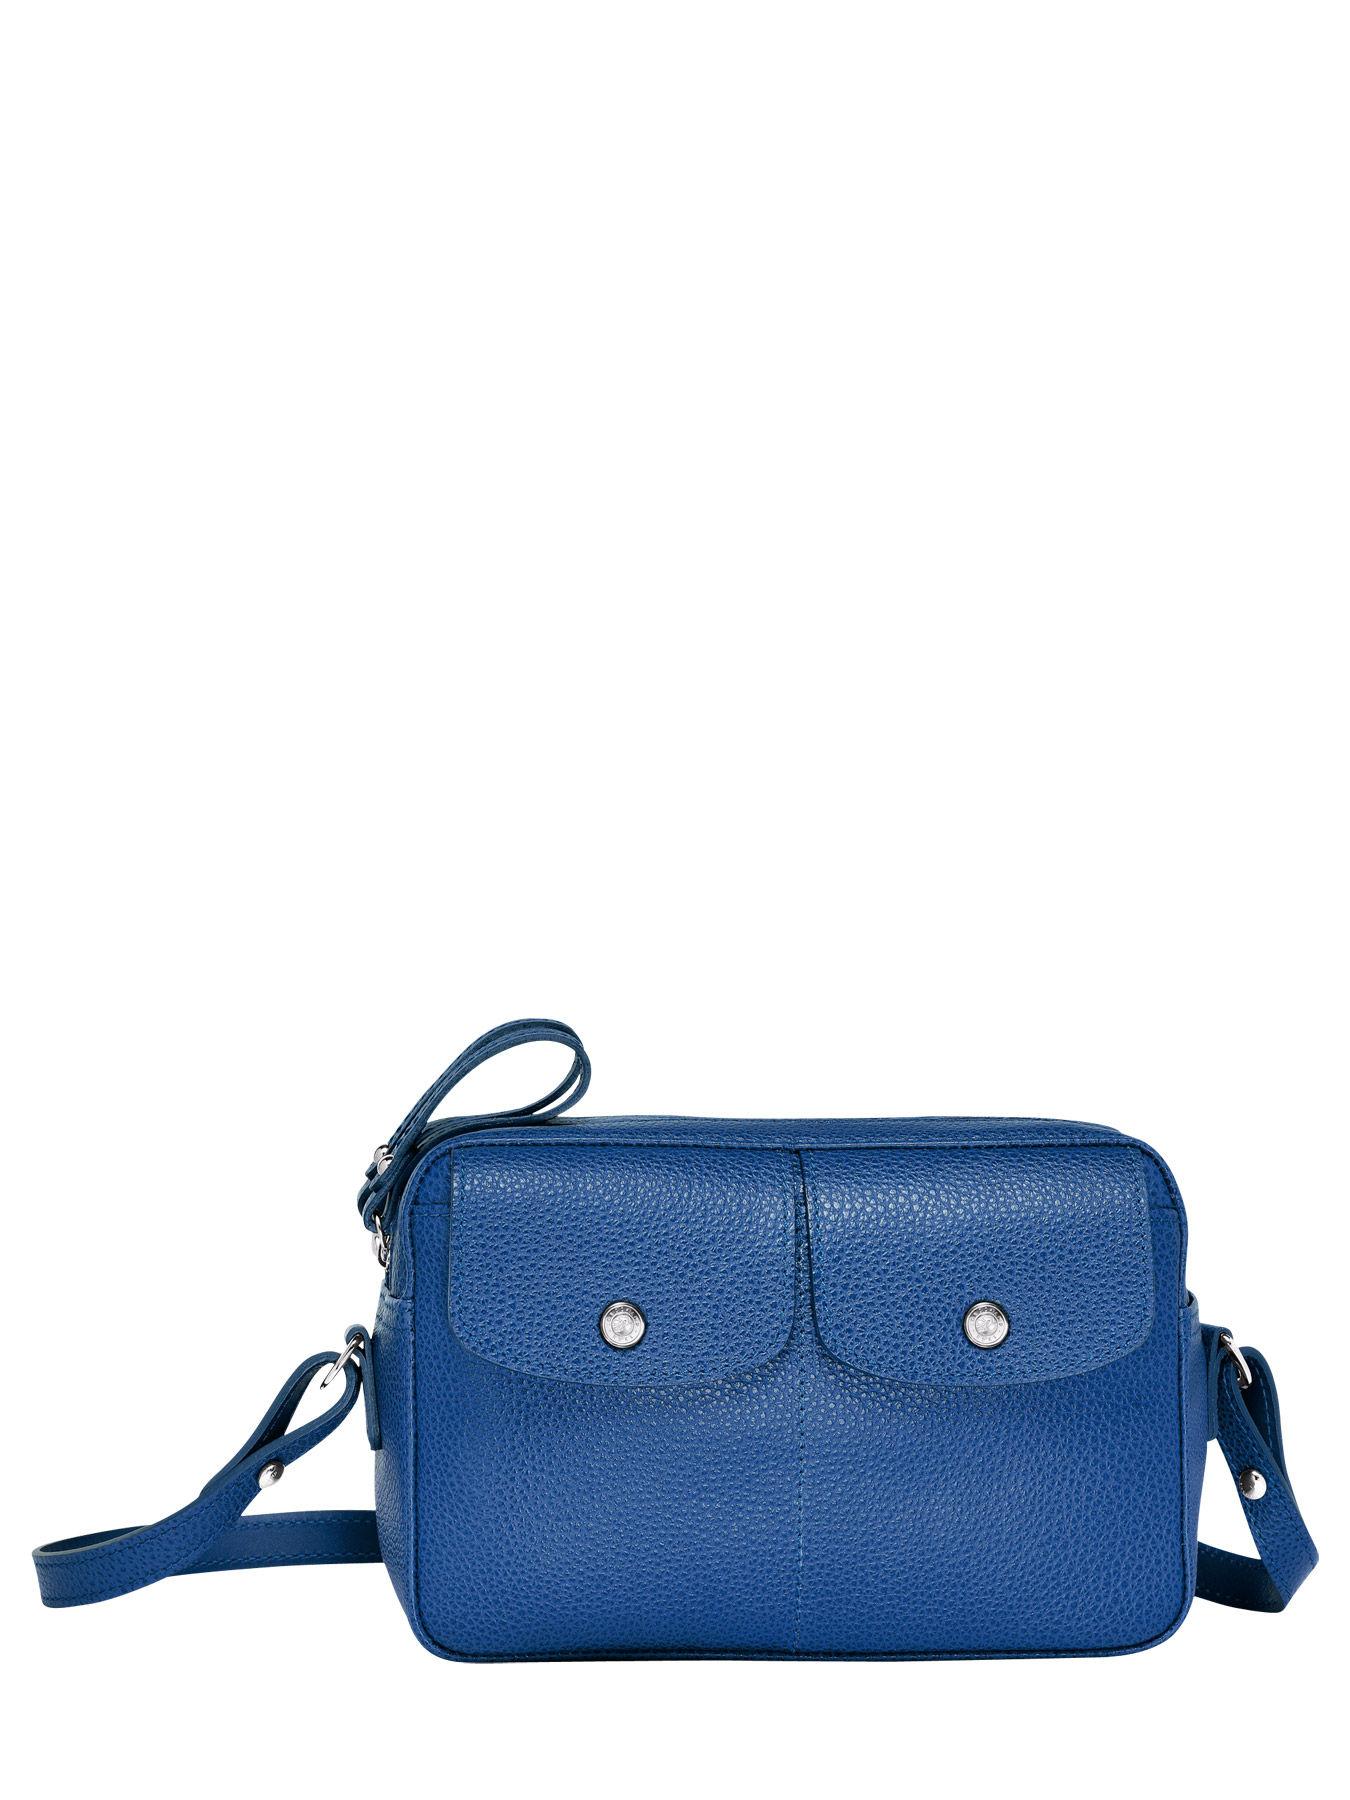 ad7b392303 Longchamp Messenger bag 2073021 - free shipping available